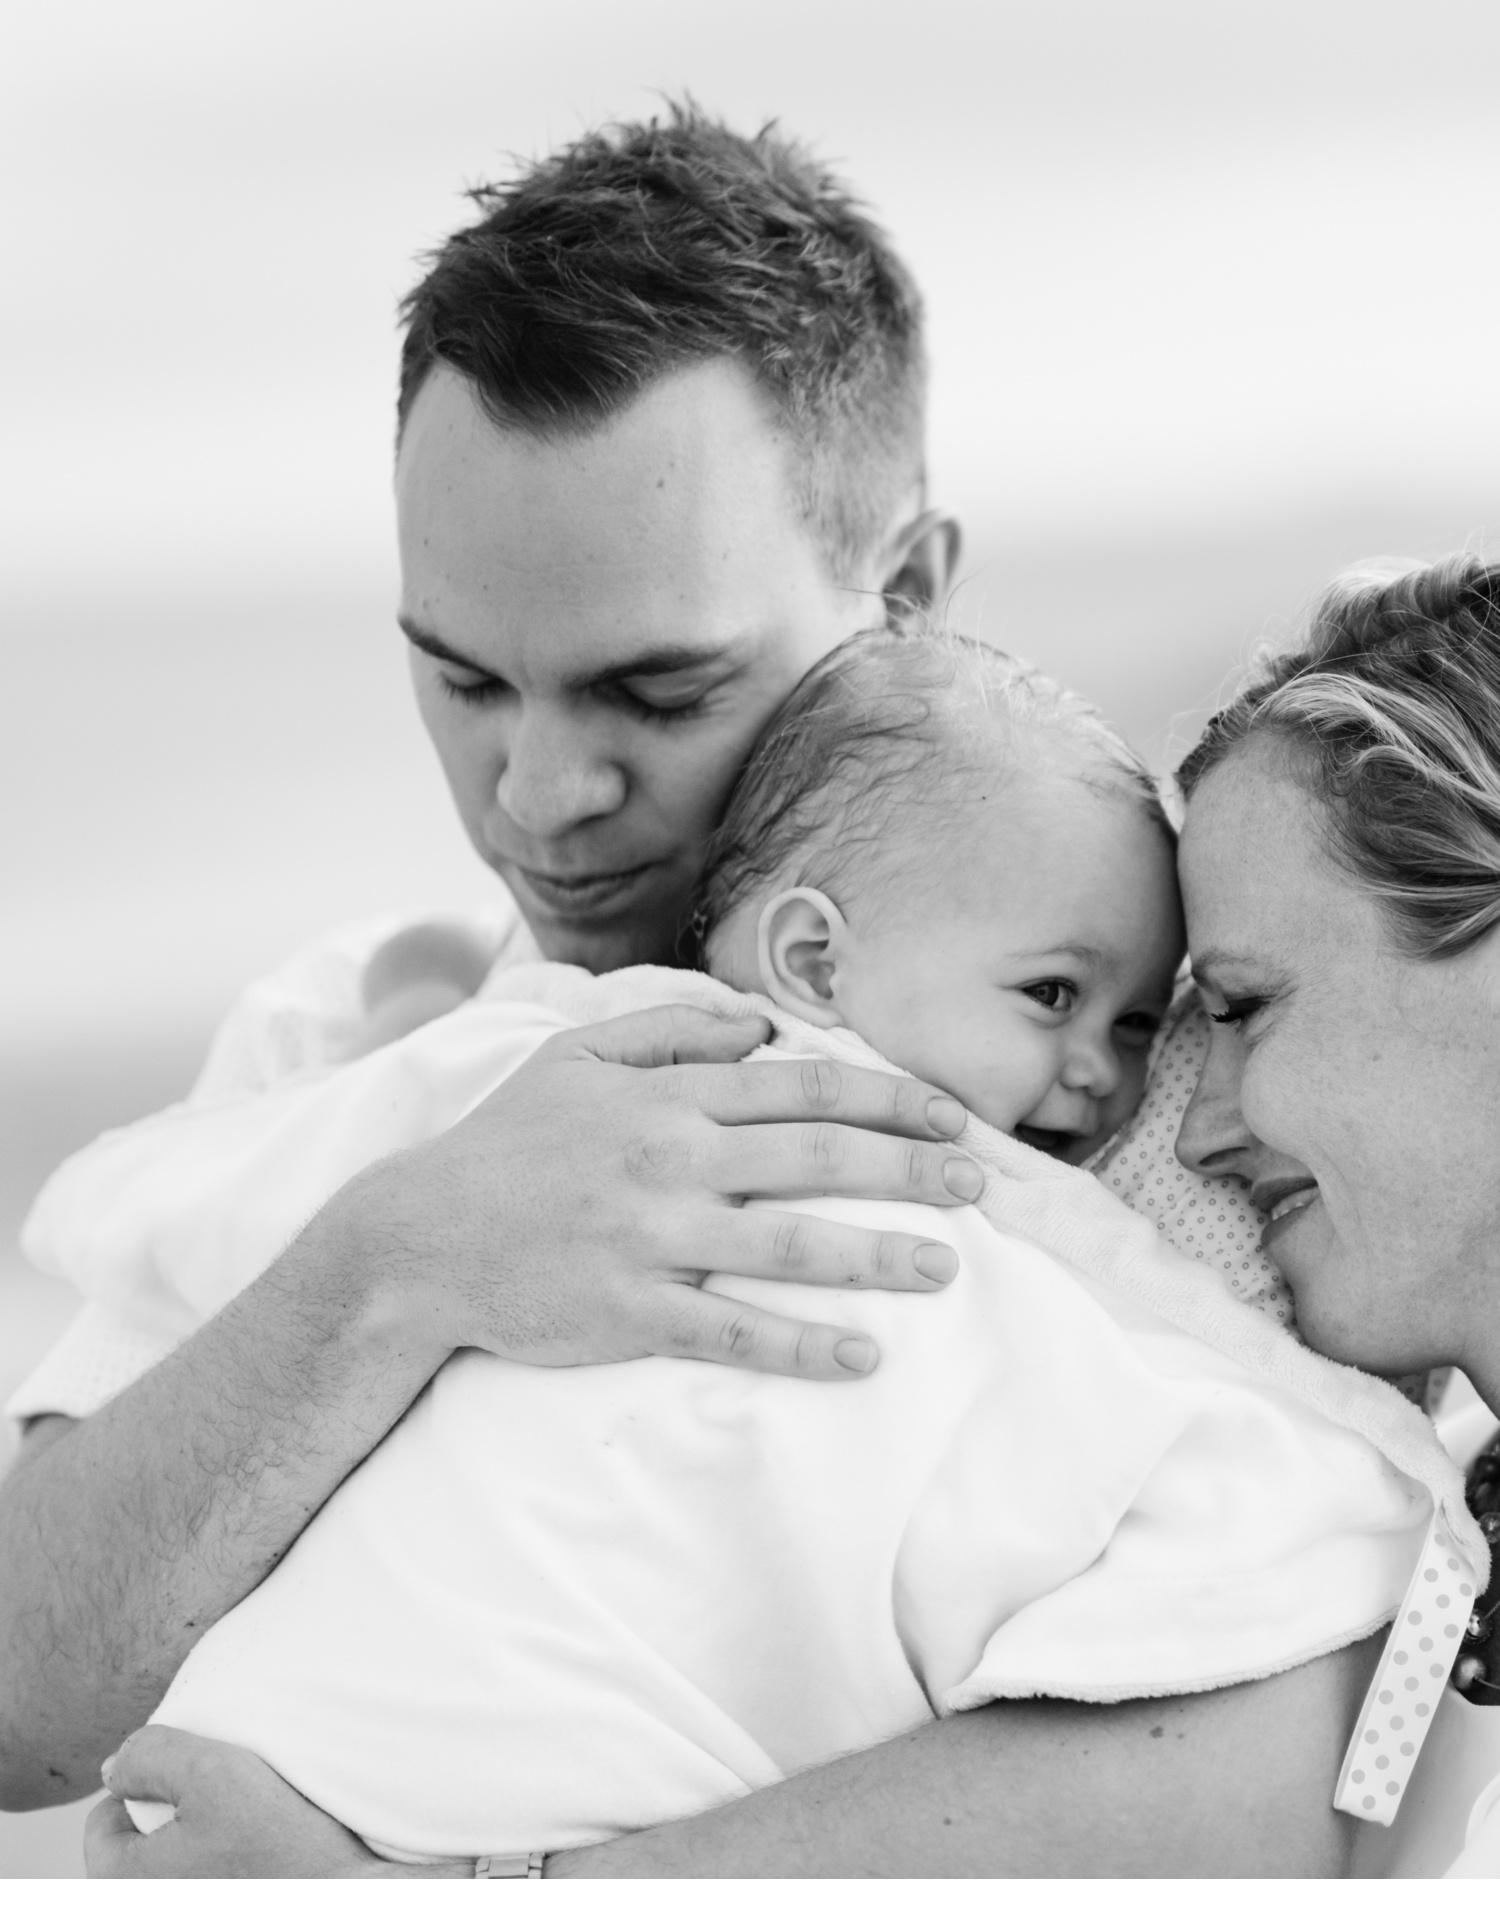 family-lifestyle-photography-brighton-beach24.jpg